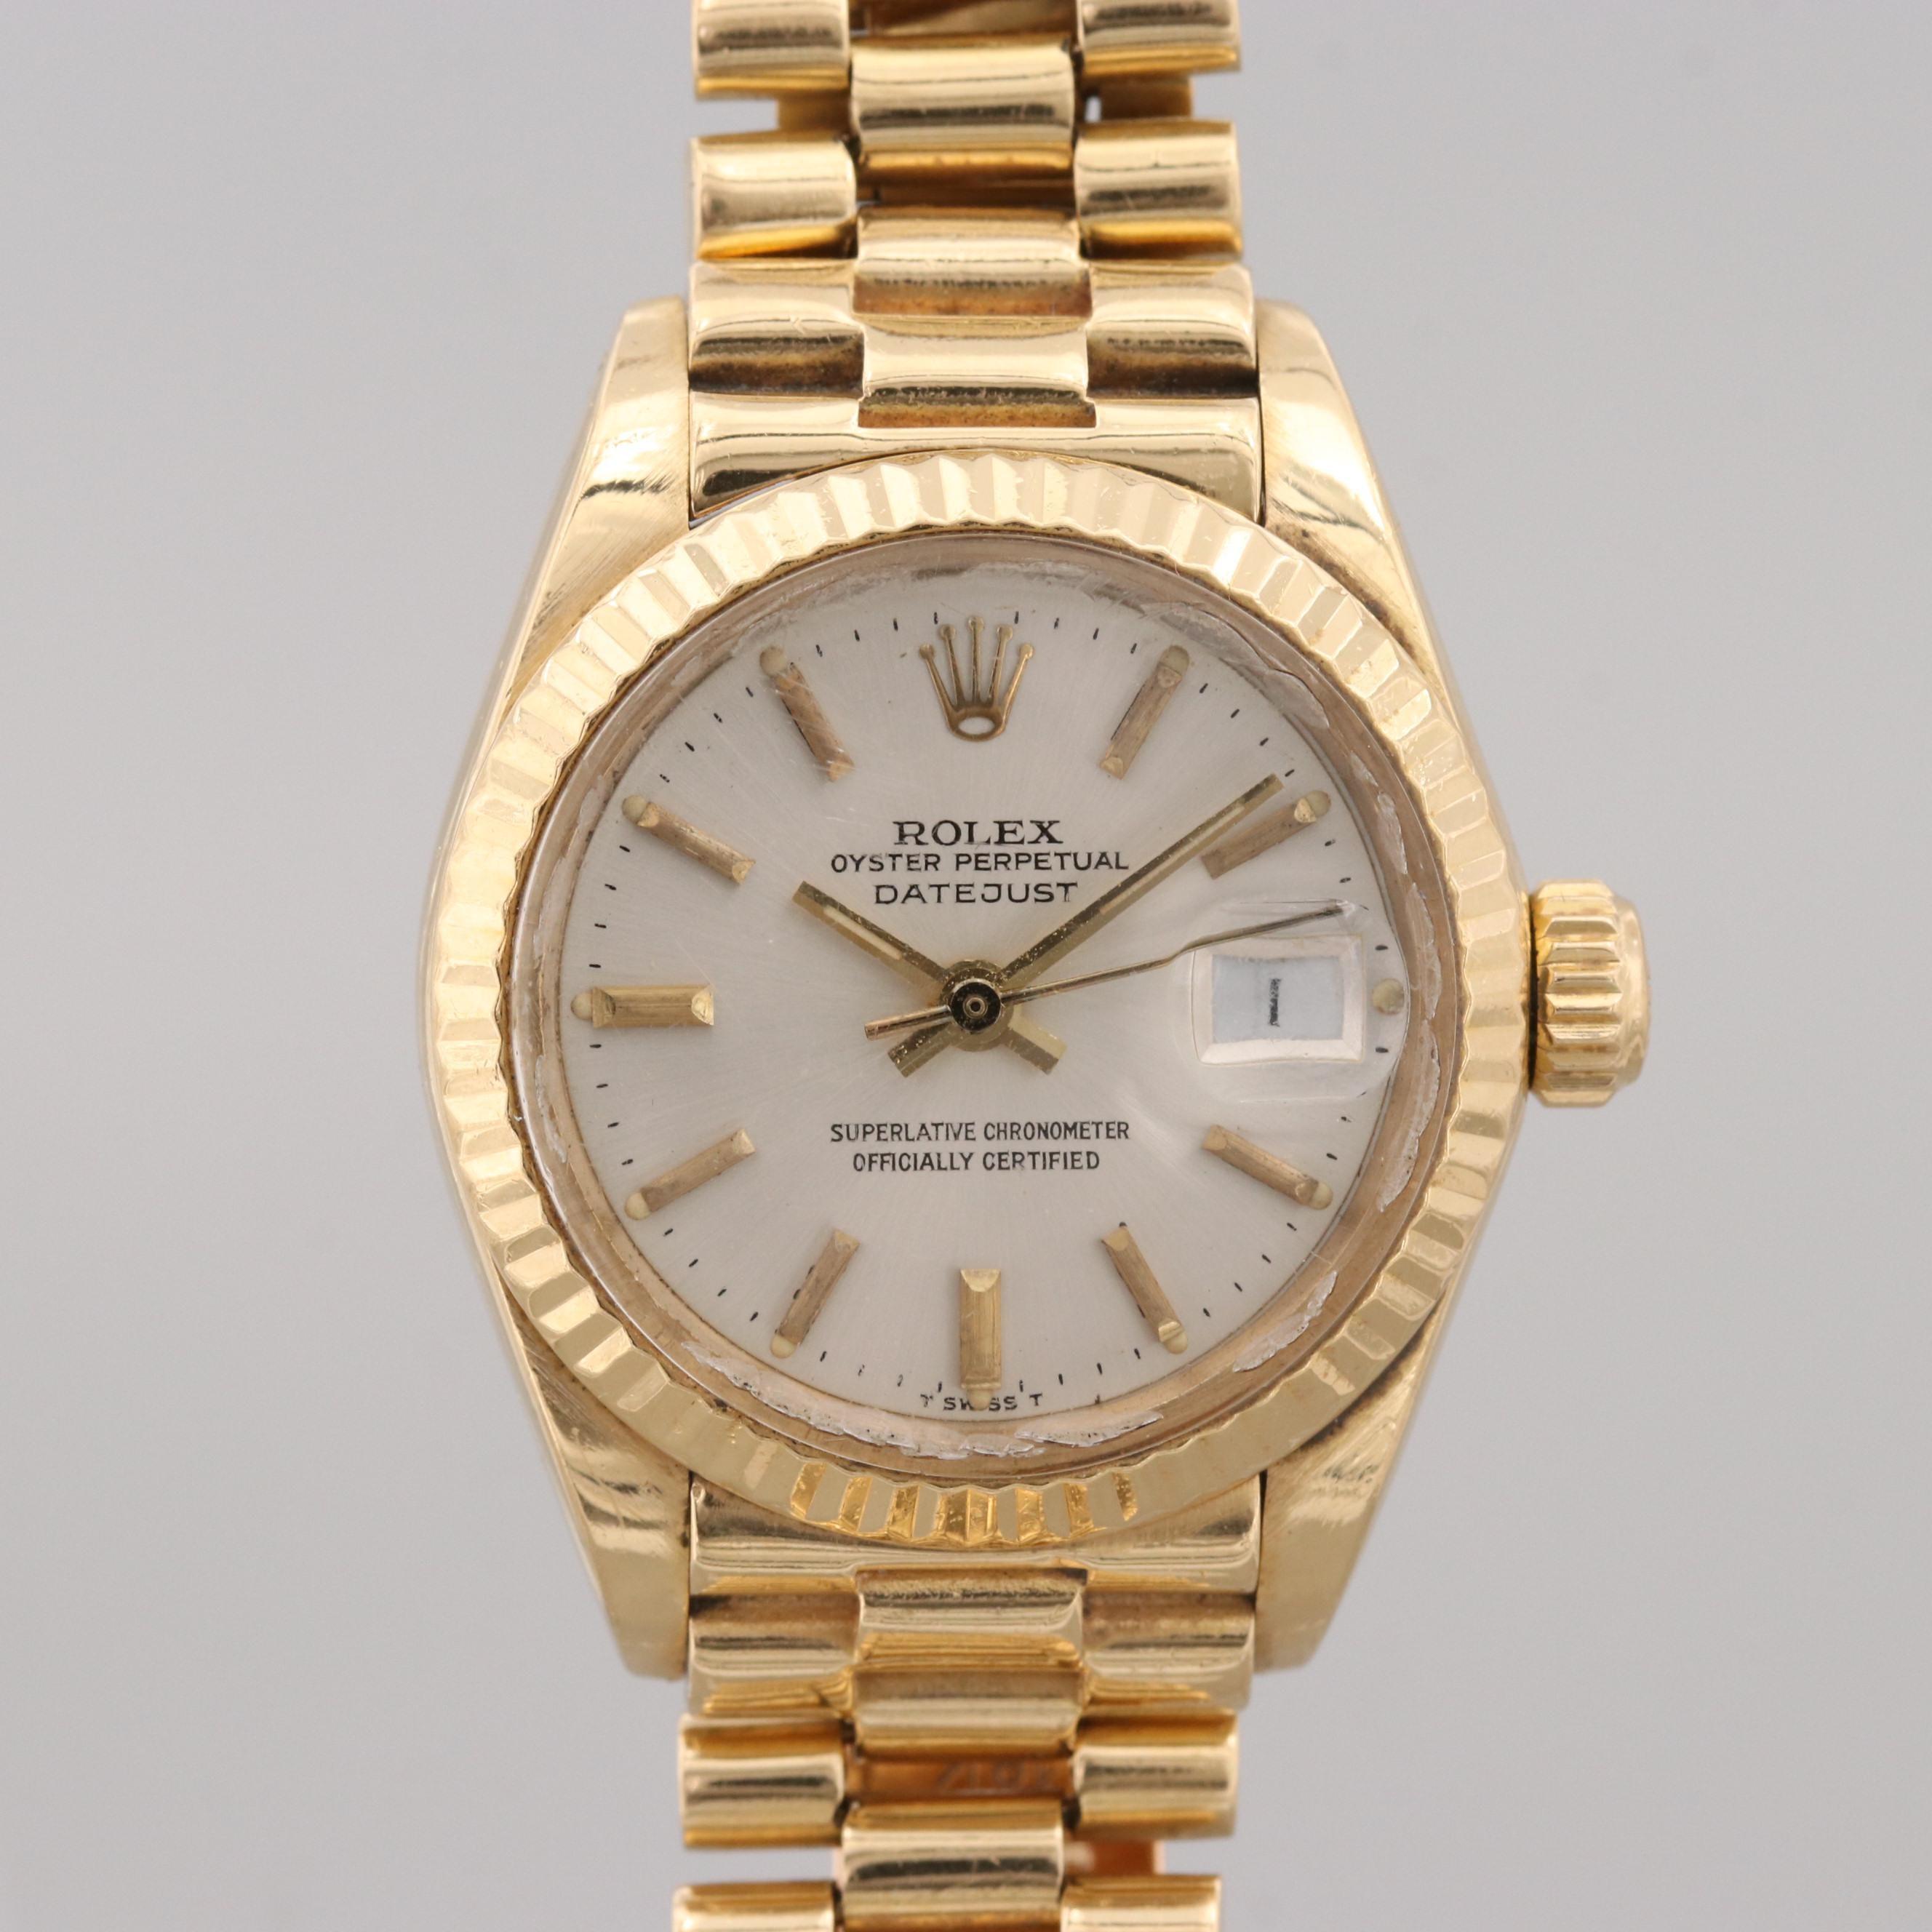 Vintage Rolex Datejust 18K Yellow Gold Automatic Wristwatch, 1980